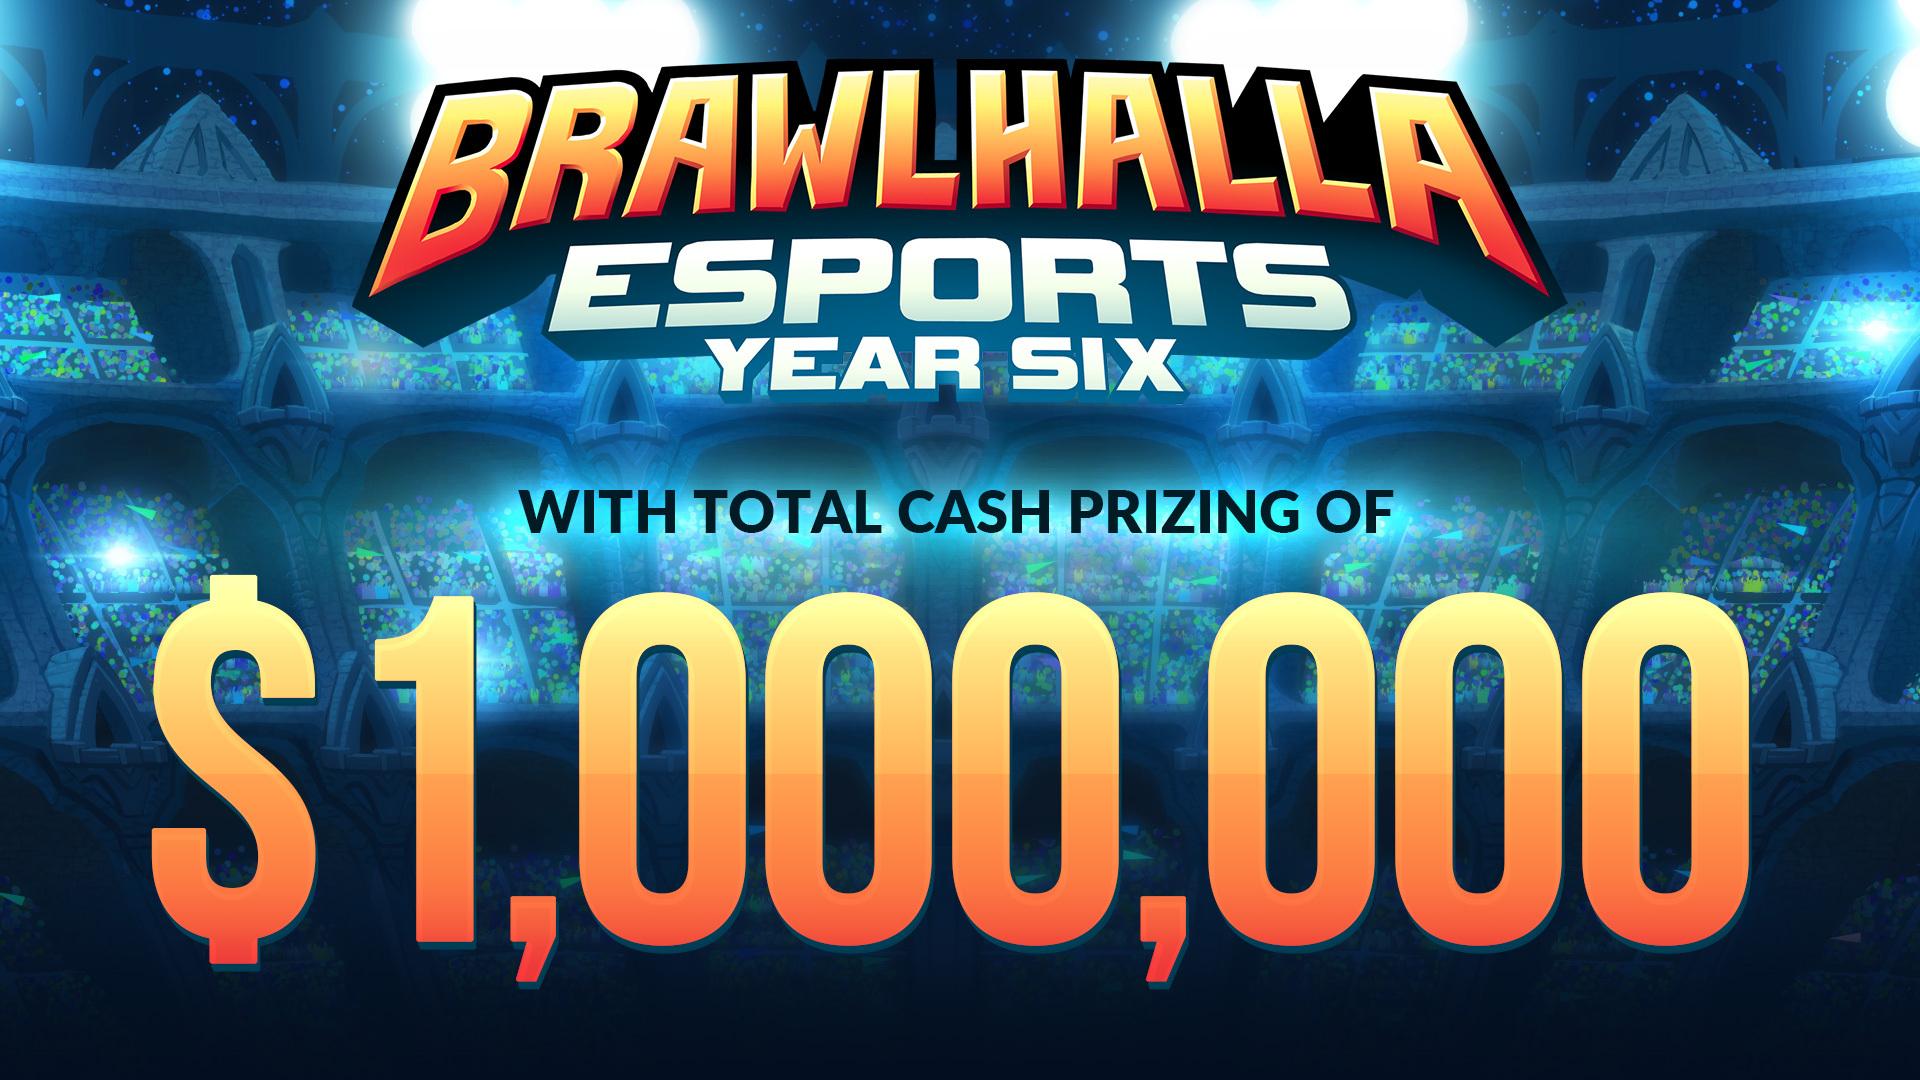 BWH_Esports_ka_1M_Prize_Pool_A_20210201_1130pm_CET.jpg.jpg